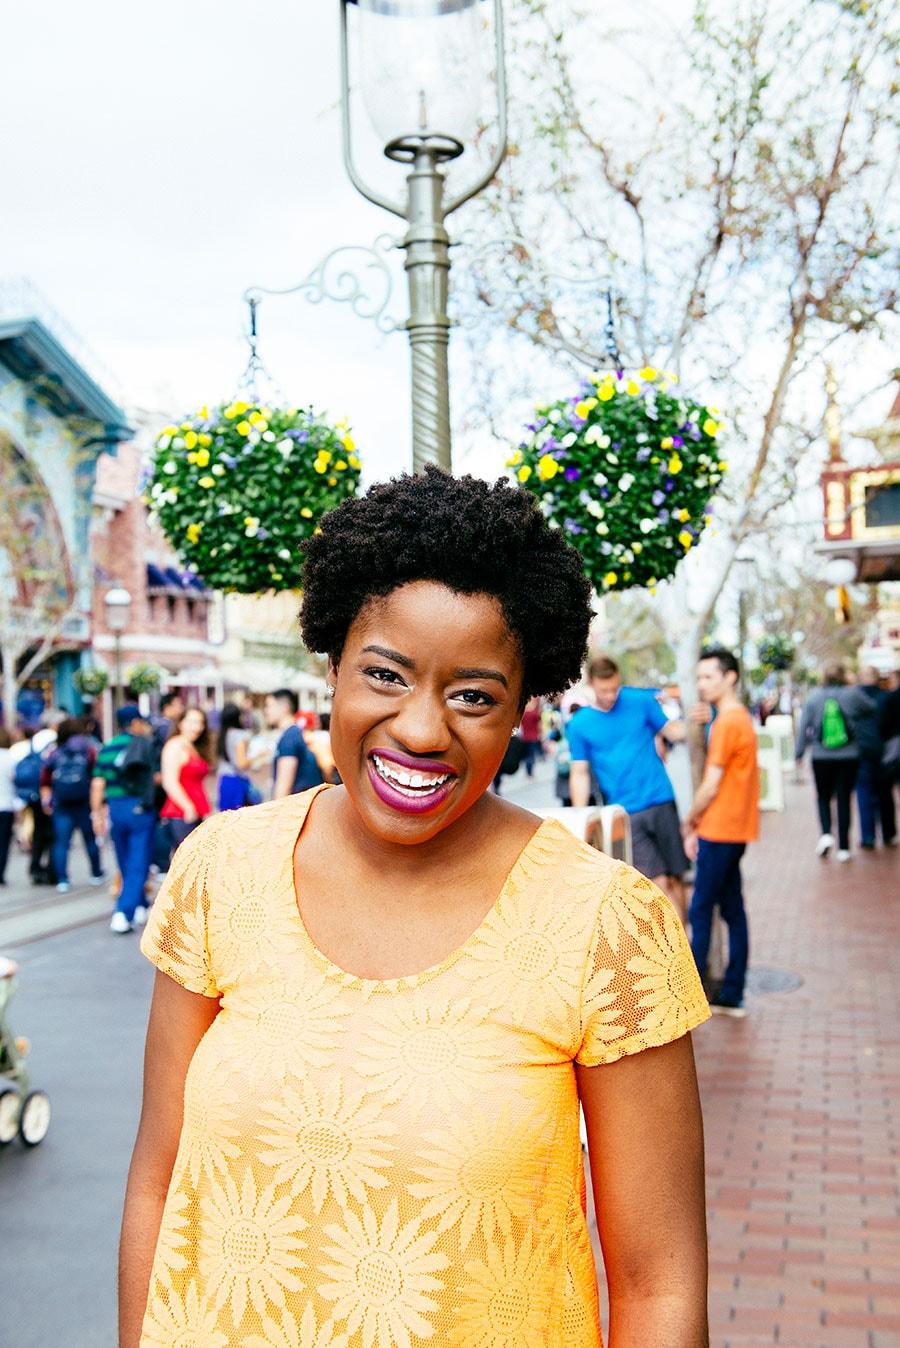 This Week in Disney Parks Photos: #ShareYourEars